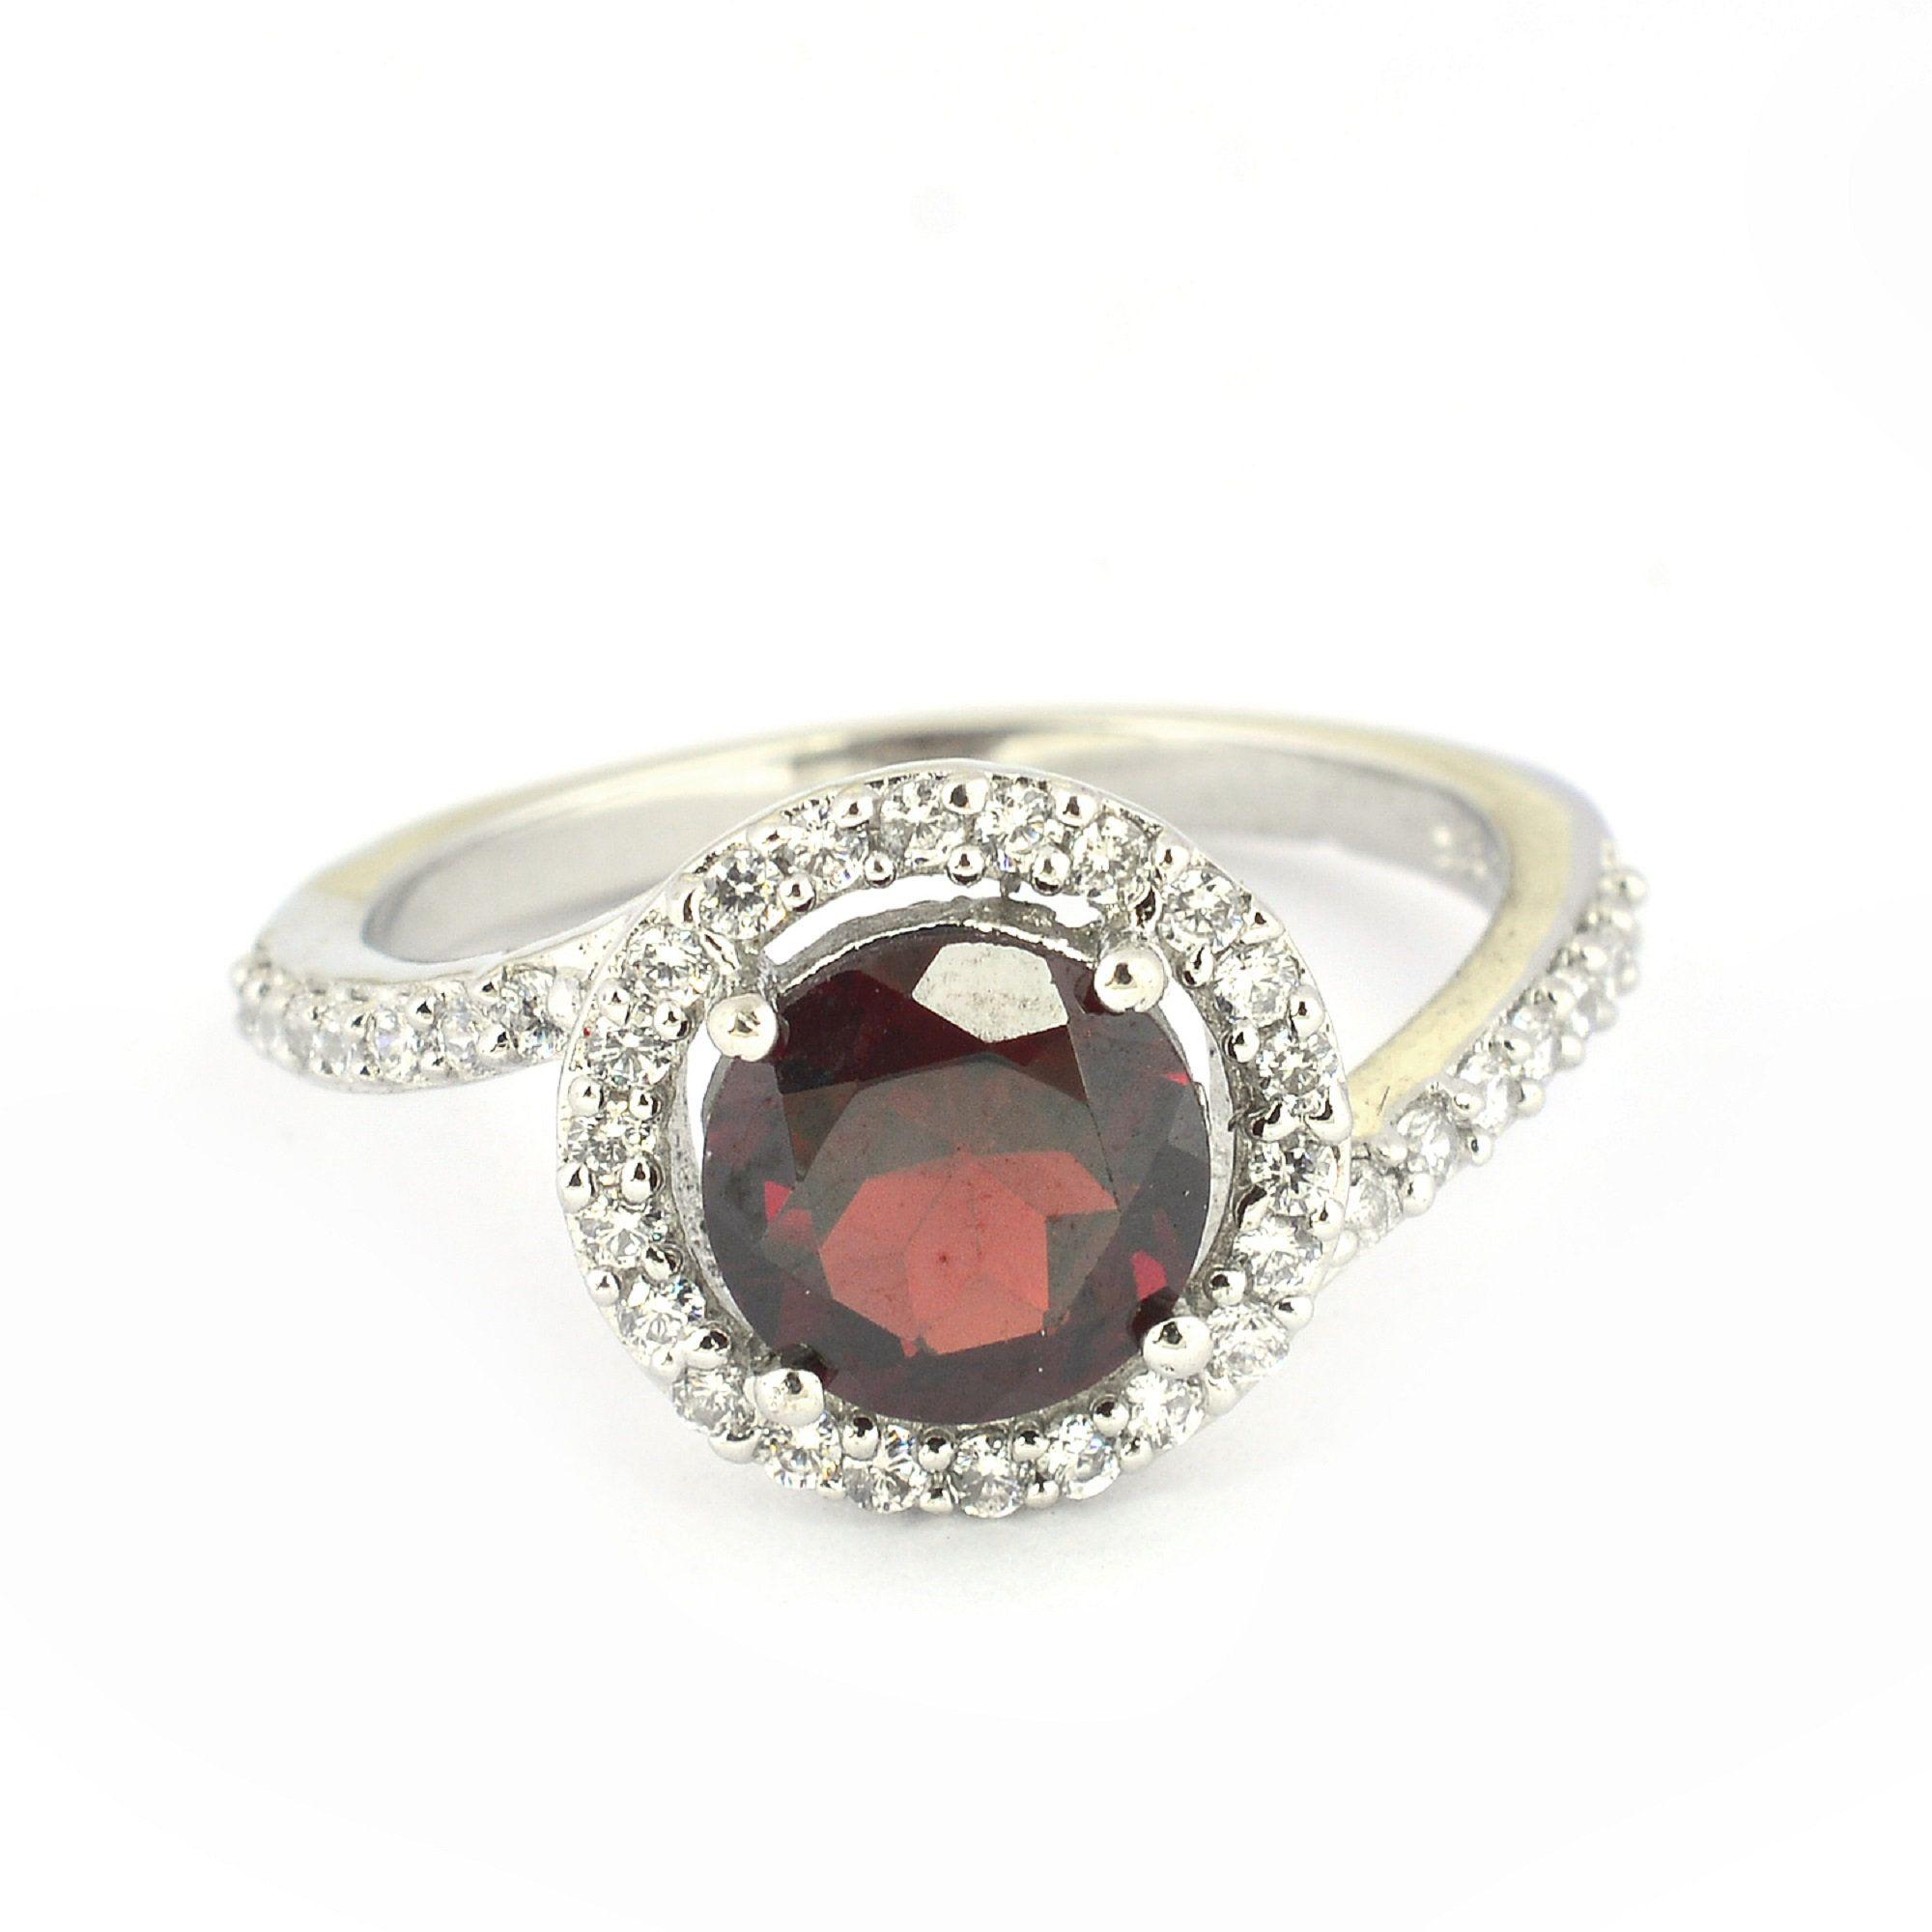 Natural Red Garnet Ring  Genuine Gemstone Ring  Dainty Garnet Jewelry  January Birthstone Ring  Anniversary Ring  Ring Gift for Her